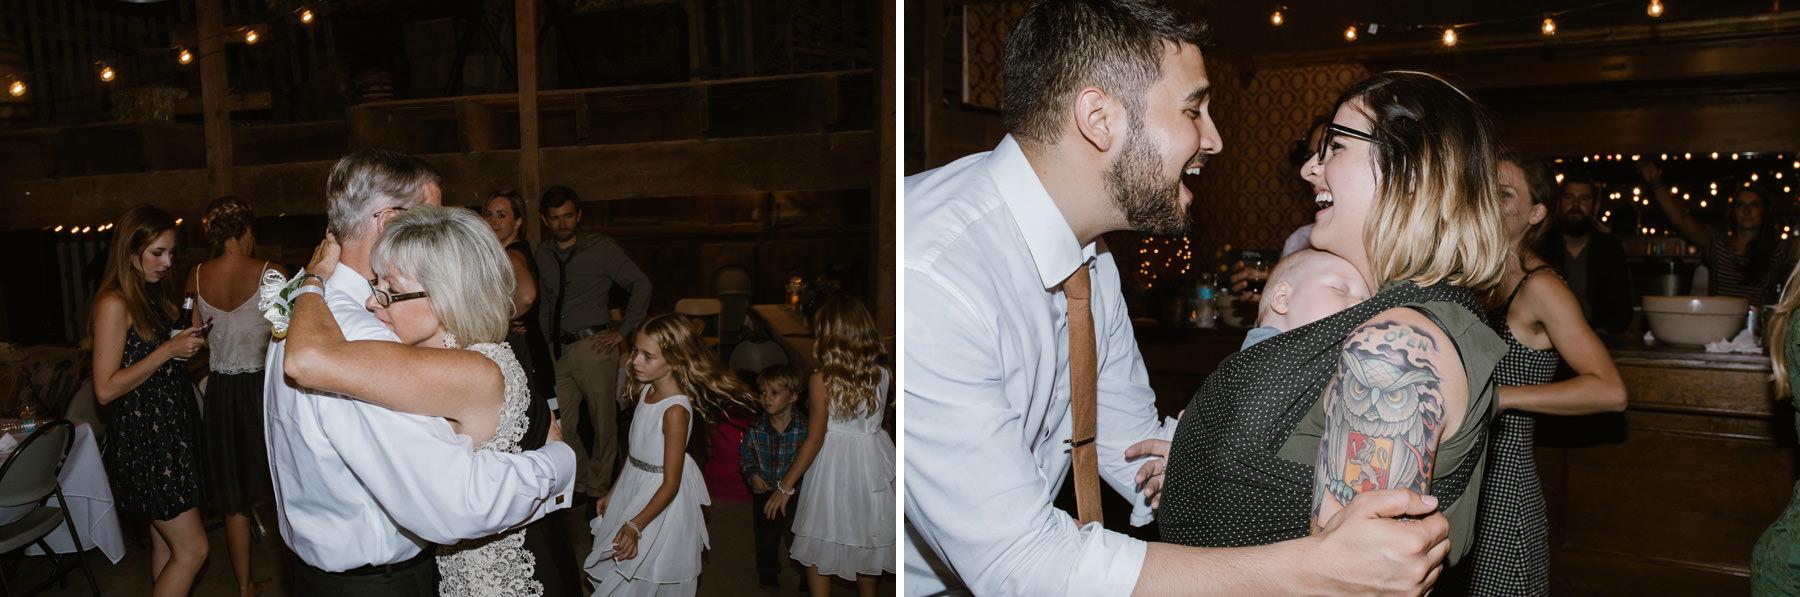 Alldredge Orchard Kansas City_Kindling Wedding Photography BLOG 90.JPG